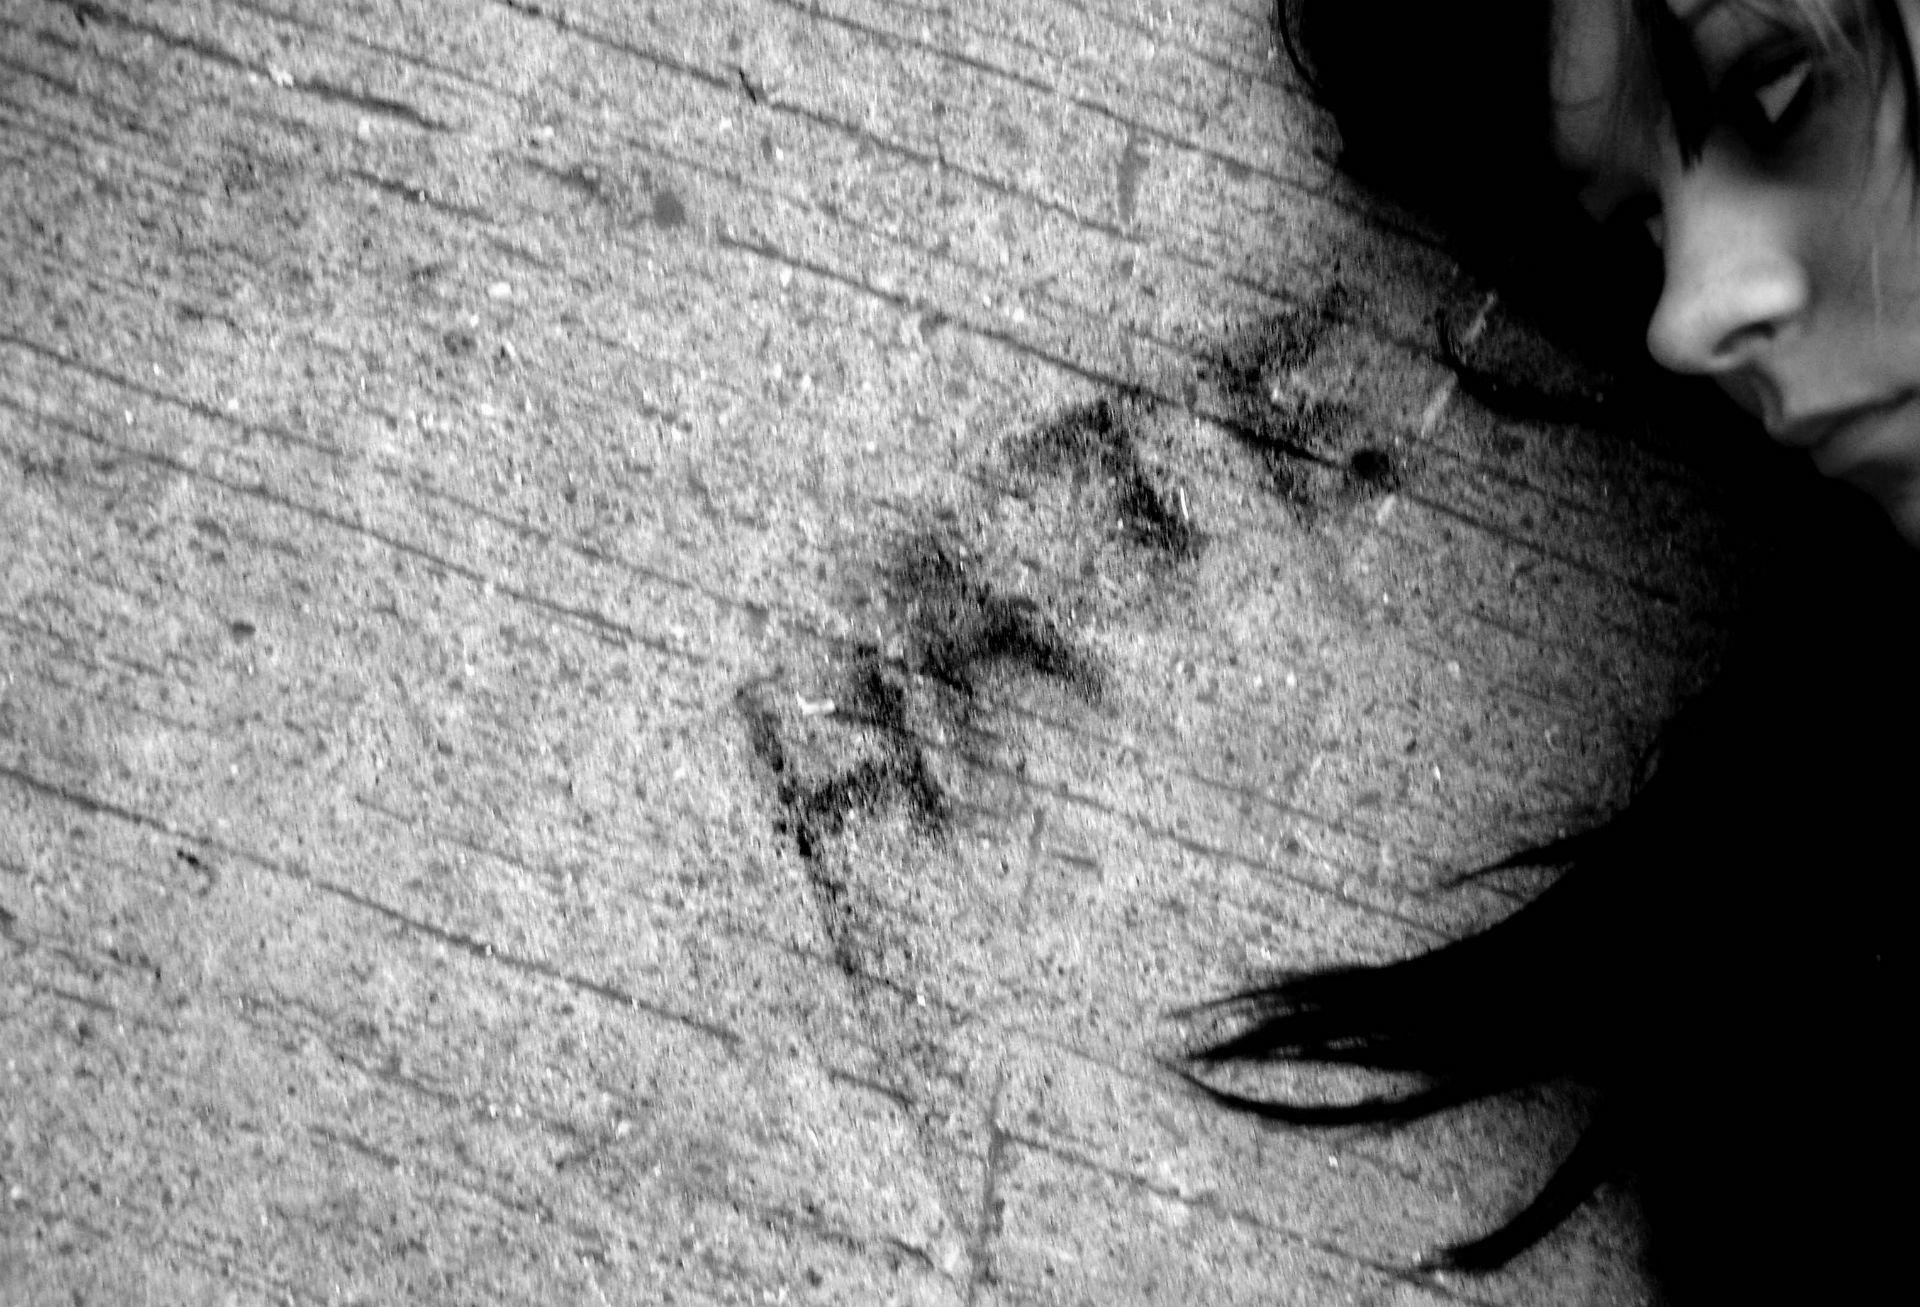 Hd wallpaper emo - Hd Wallpaper Background Id 316106 1920x1307 Dark Emo